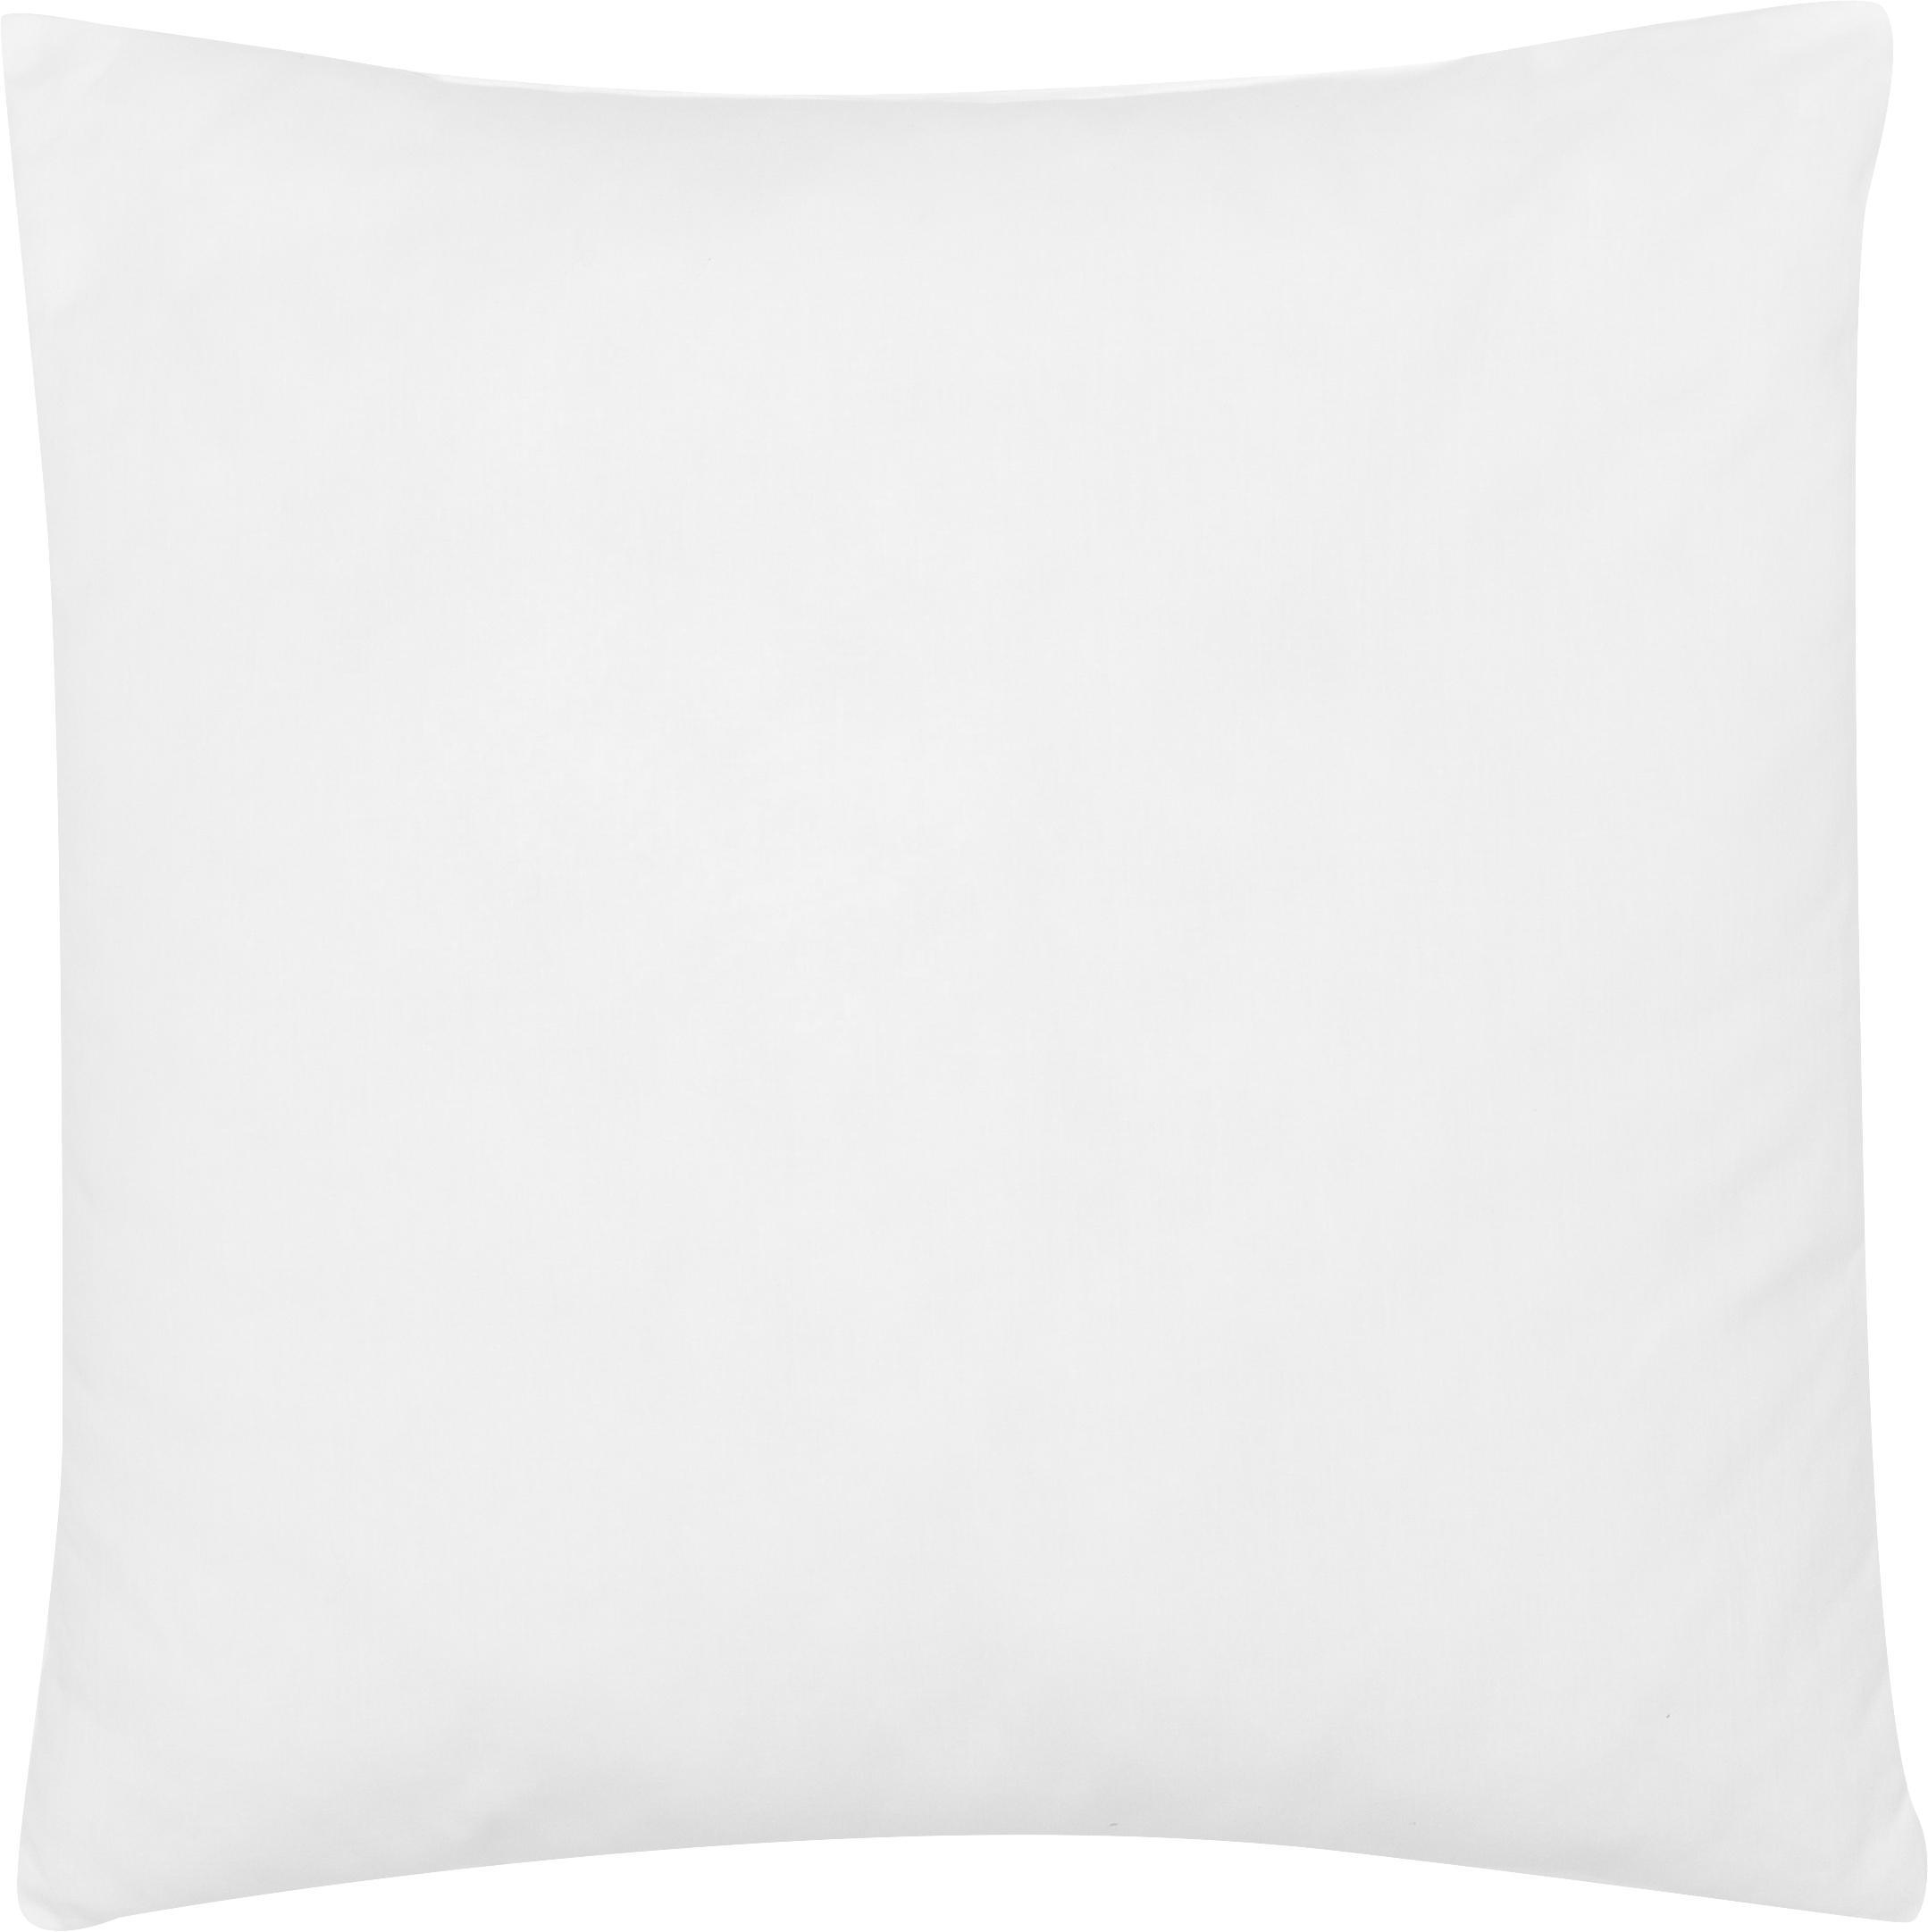 Imbottitura per cuscini in microfibra Sia, 45 x 45, Bianco, Larg. 45 x Lung. 45 cm